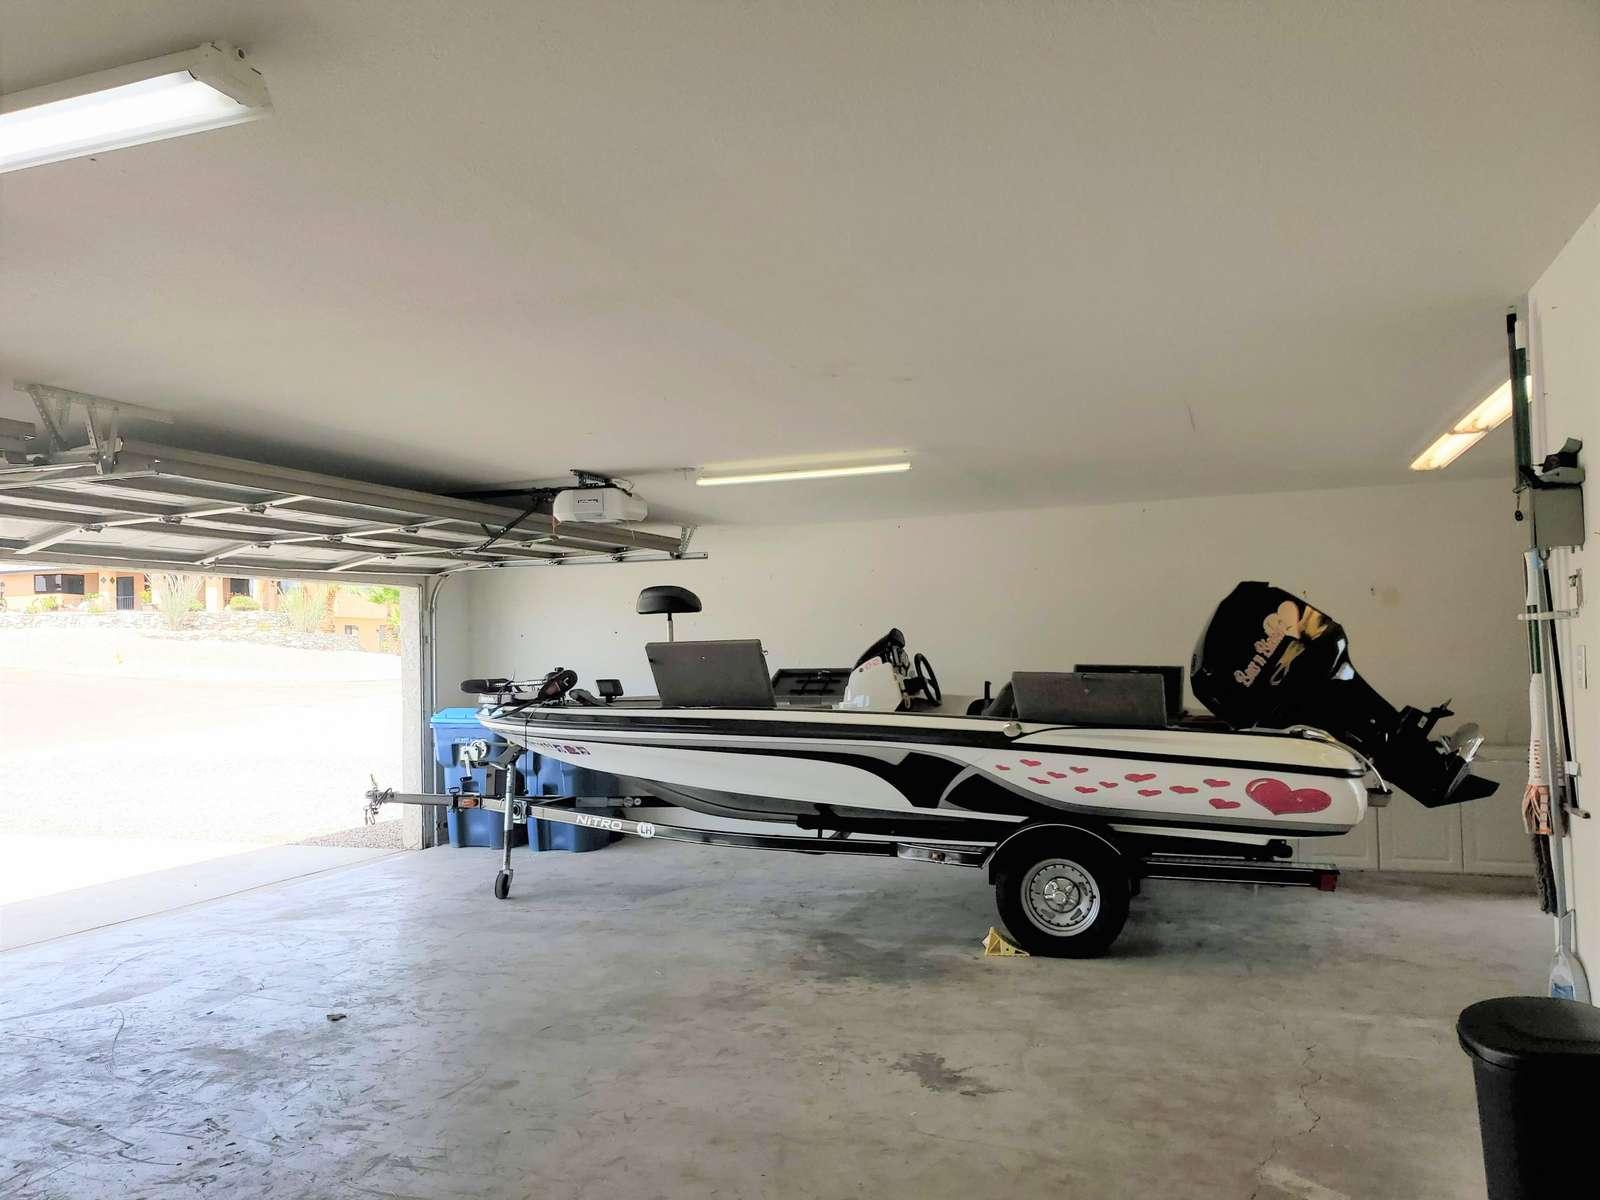 3 Car Garage - 1 30' Boat Space